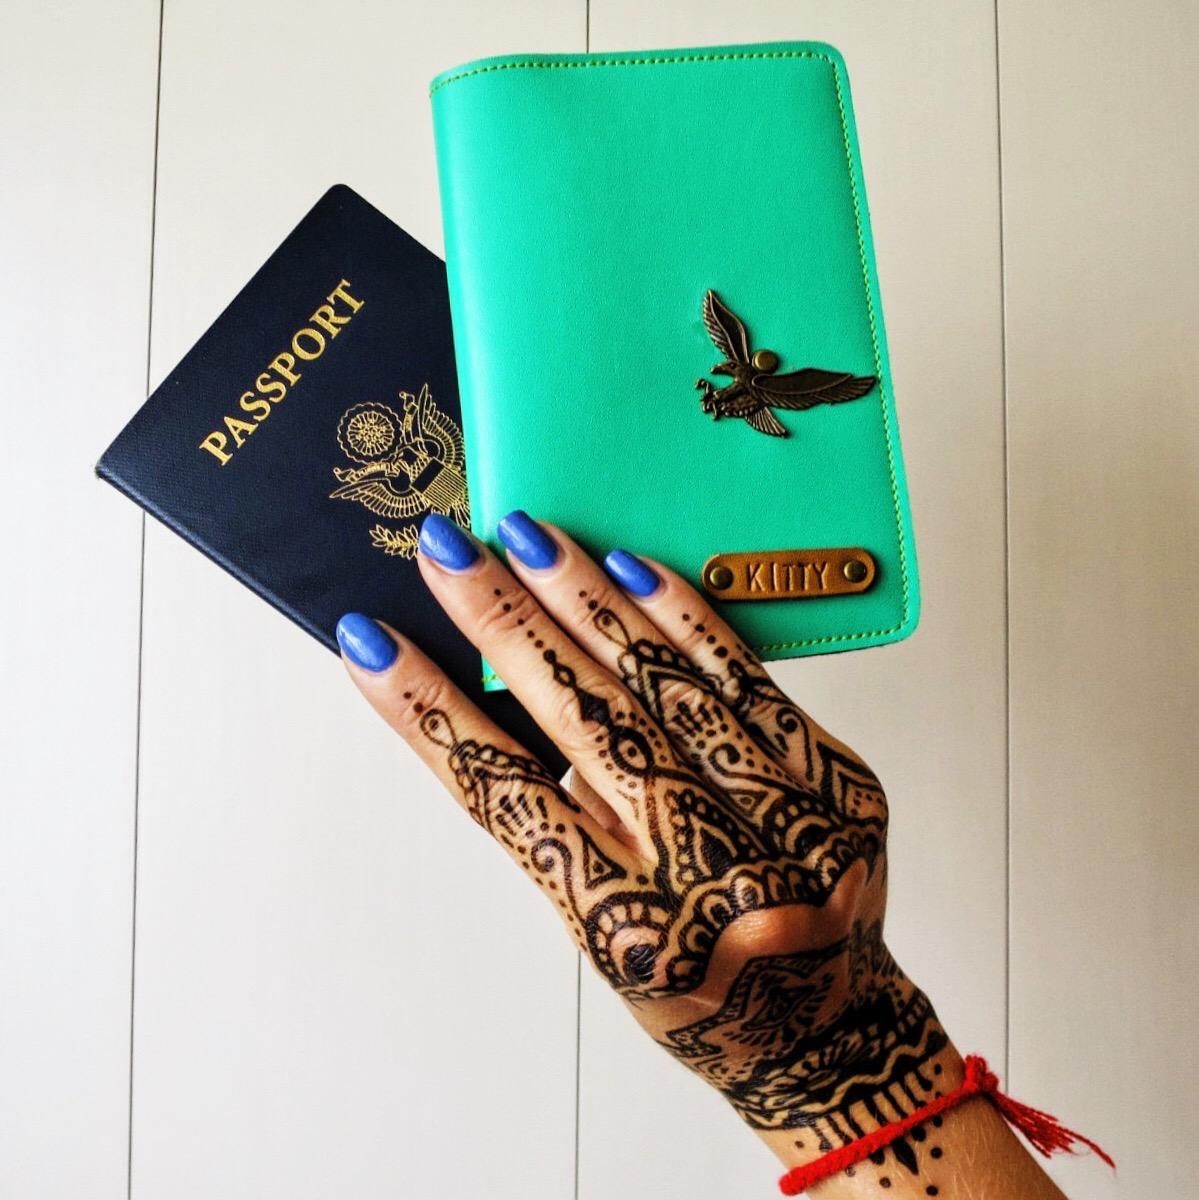 Market score: a personalized passport holder.